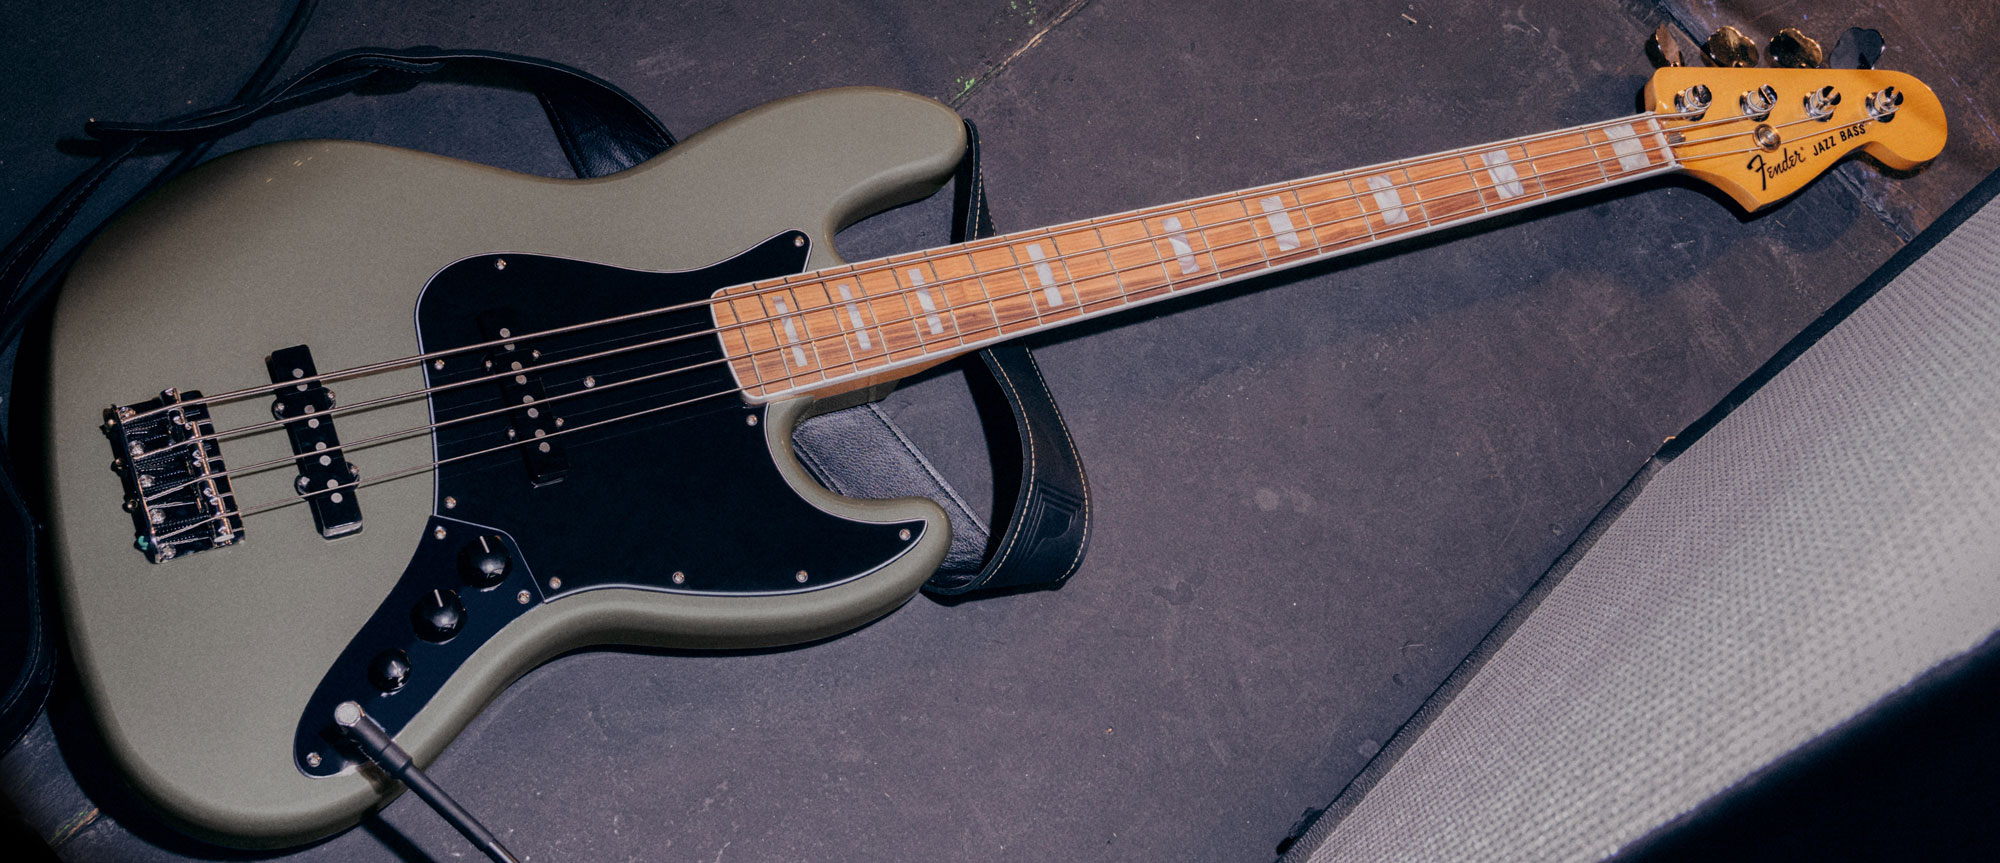 Fender Jazz Bass - Andertons Music Co.